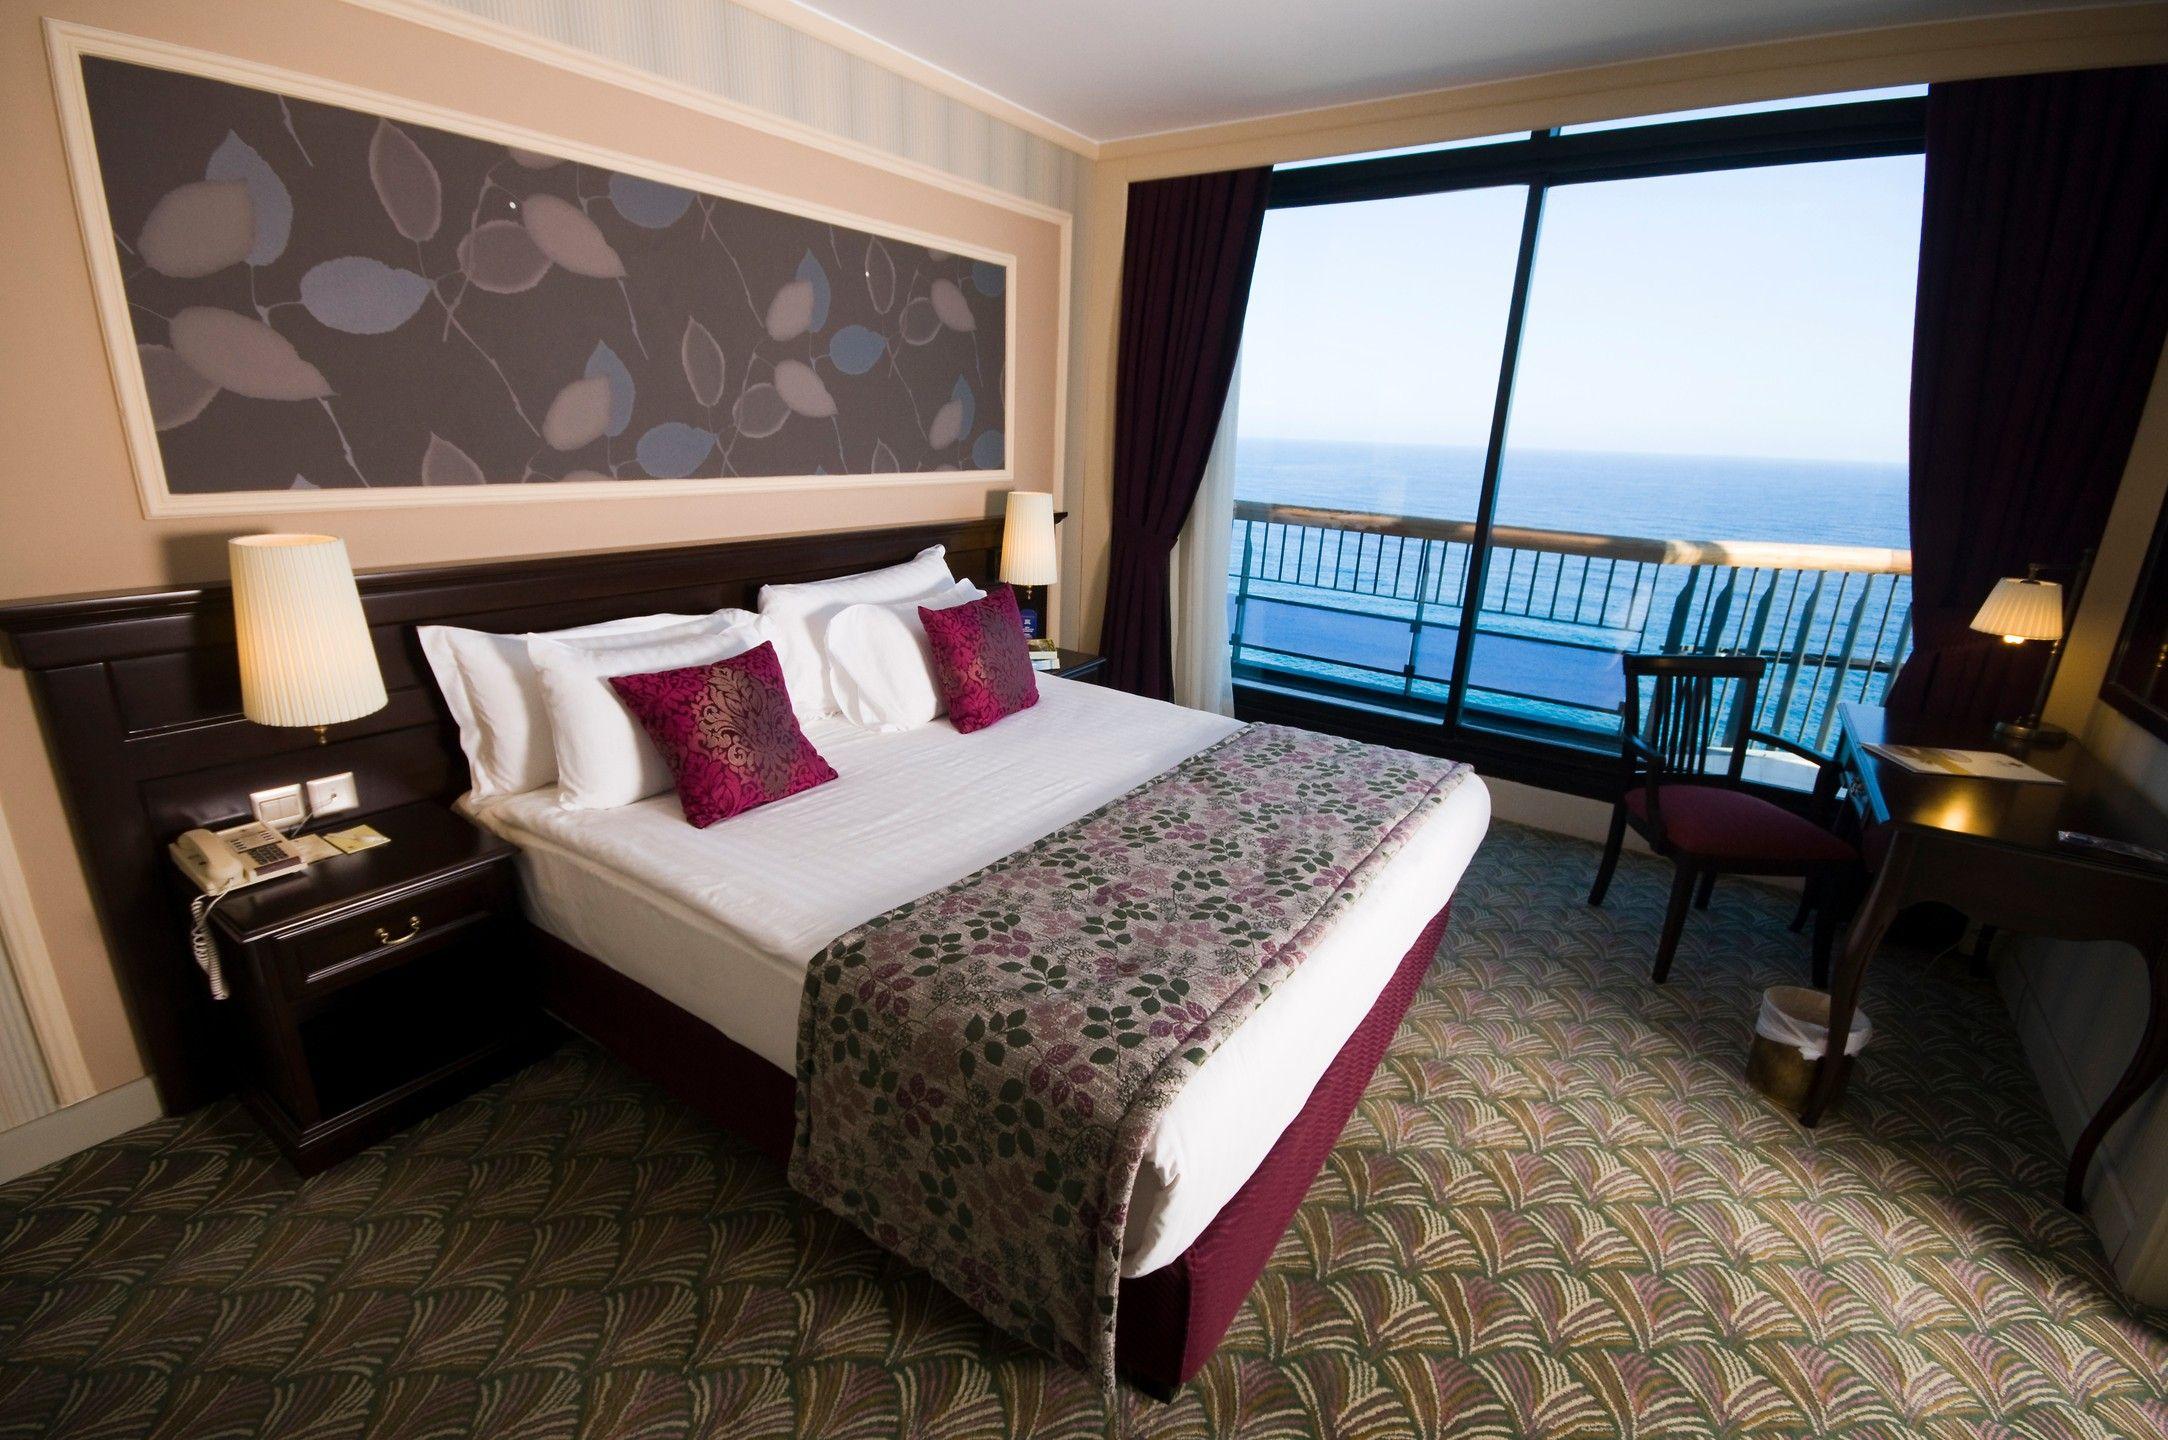 Merit crystal cove hotel casino kyrenia coupon code для prestige casino